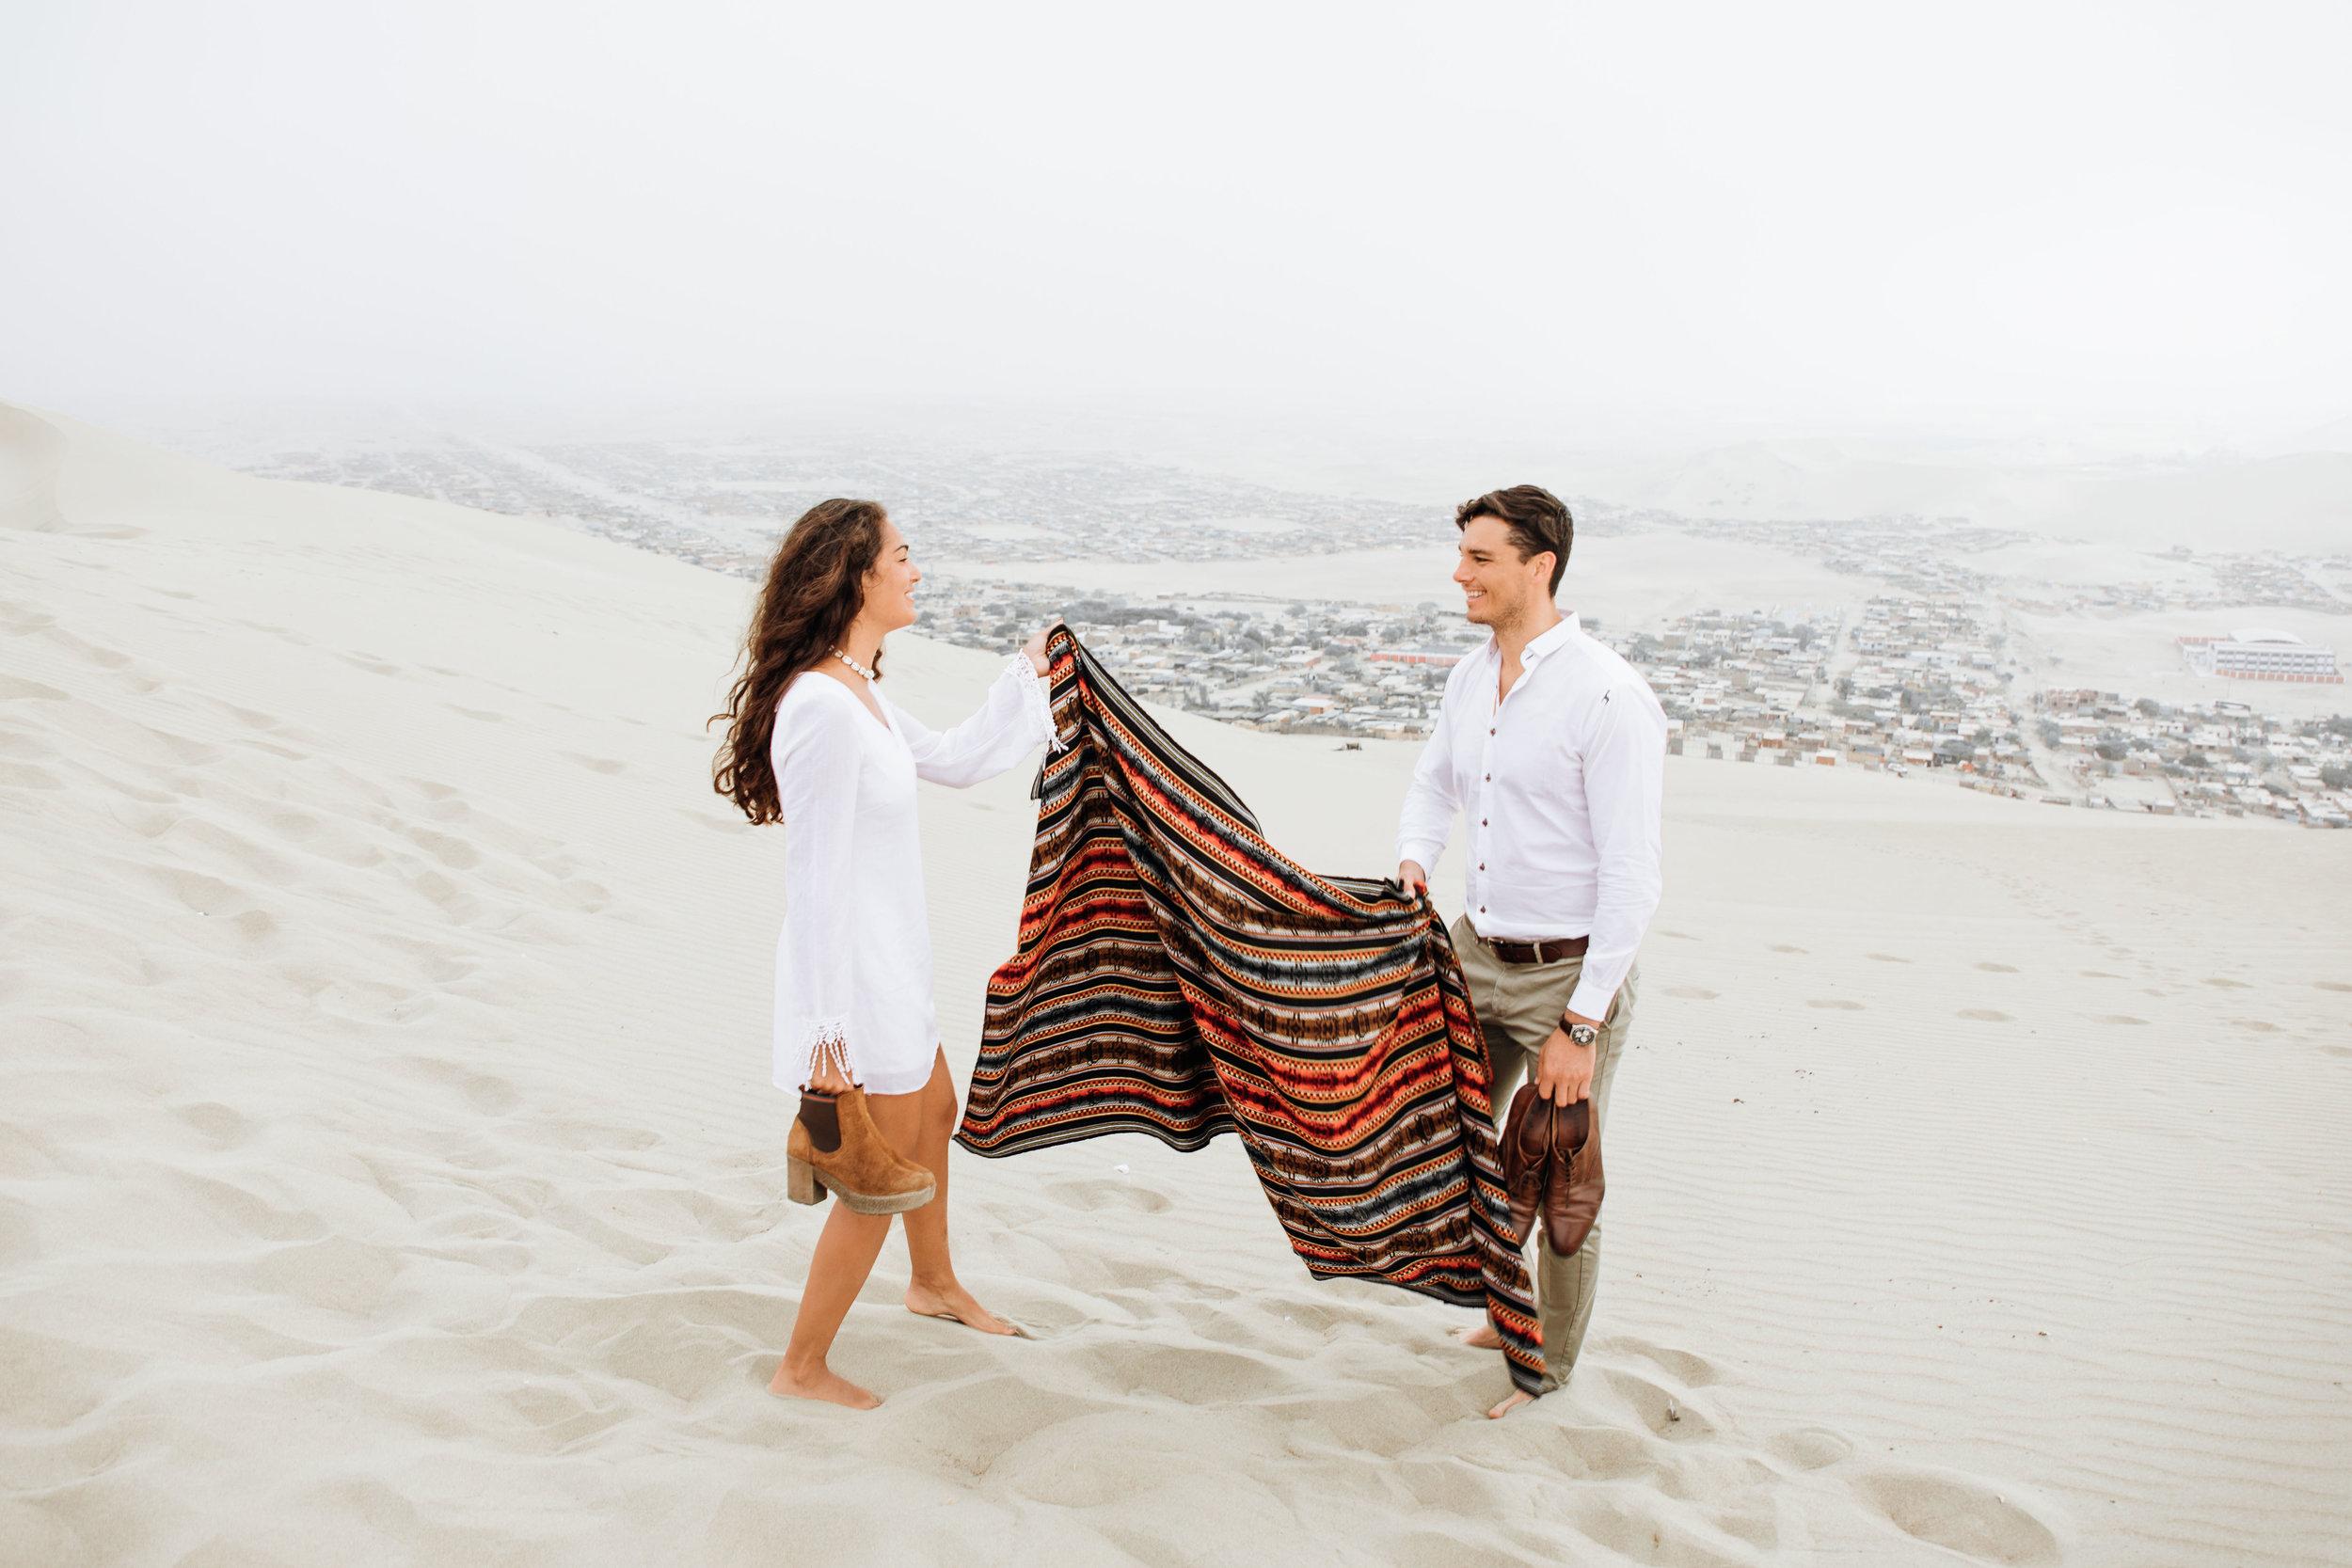 huacachina-peru-honeymoon-elopement-destination-wedding-photography-michael-cozzens-35.jpg